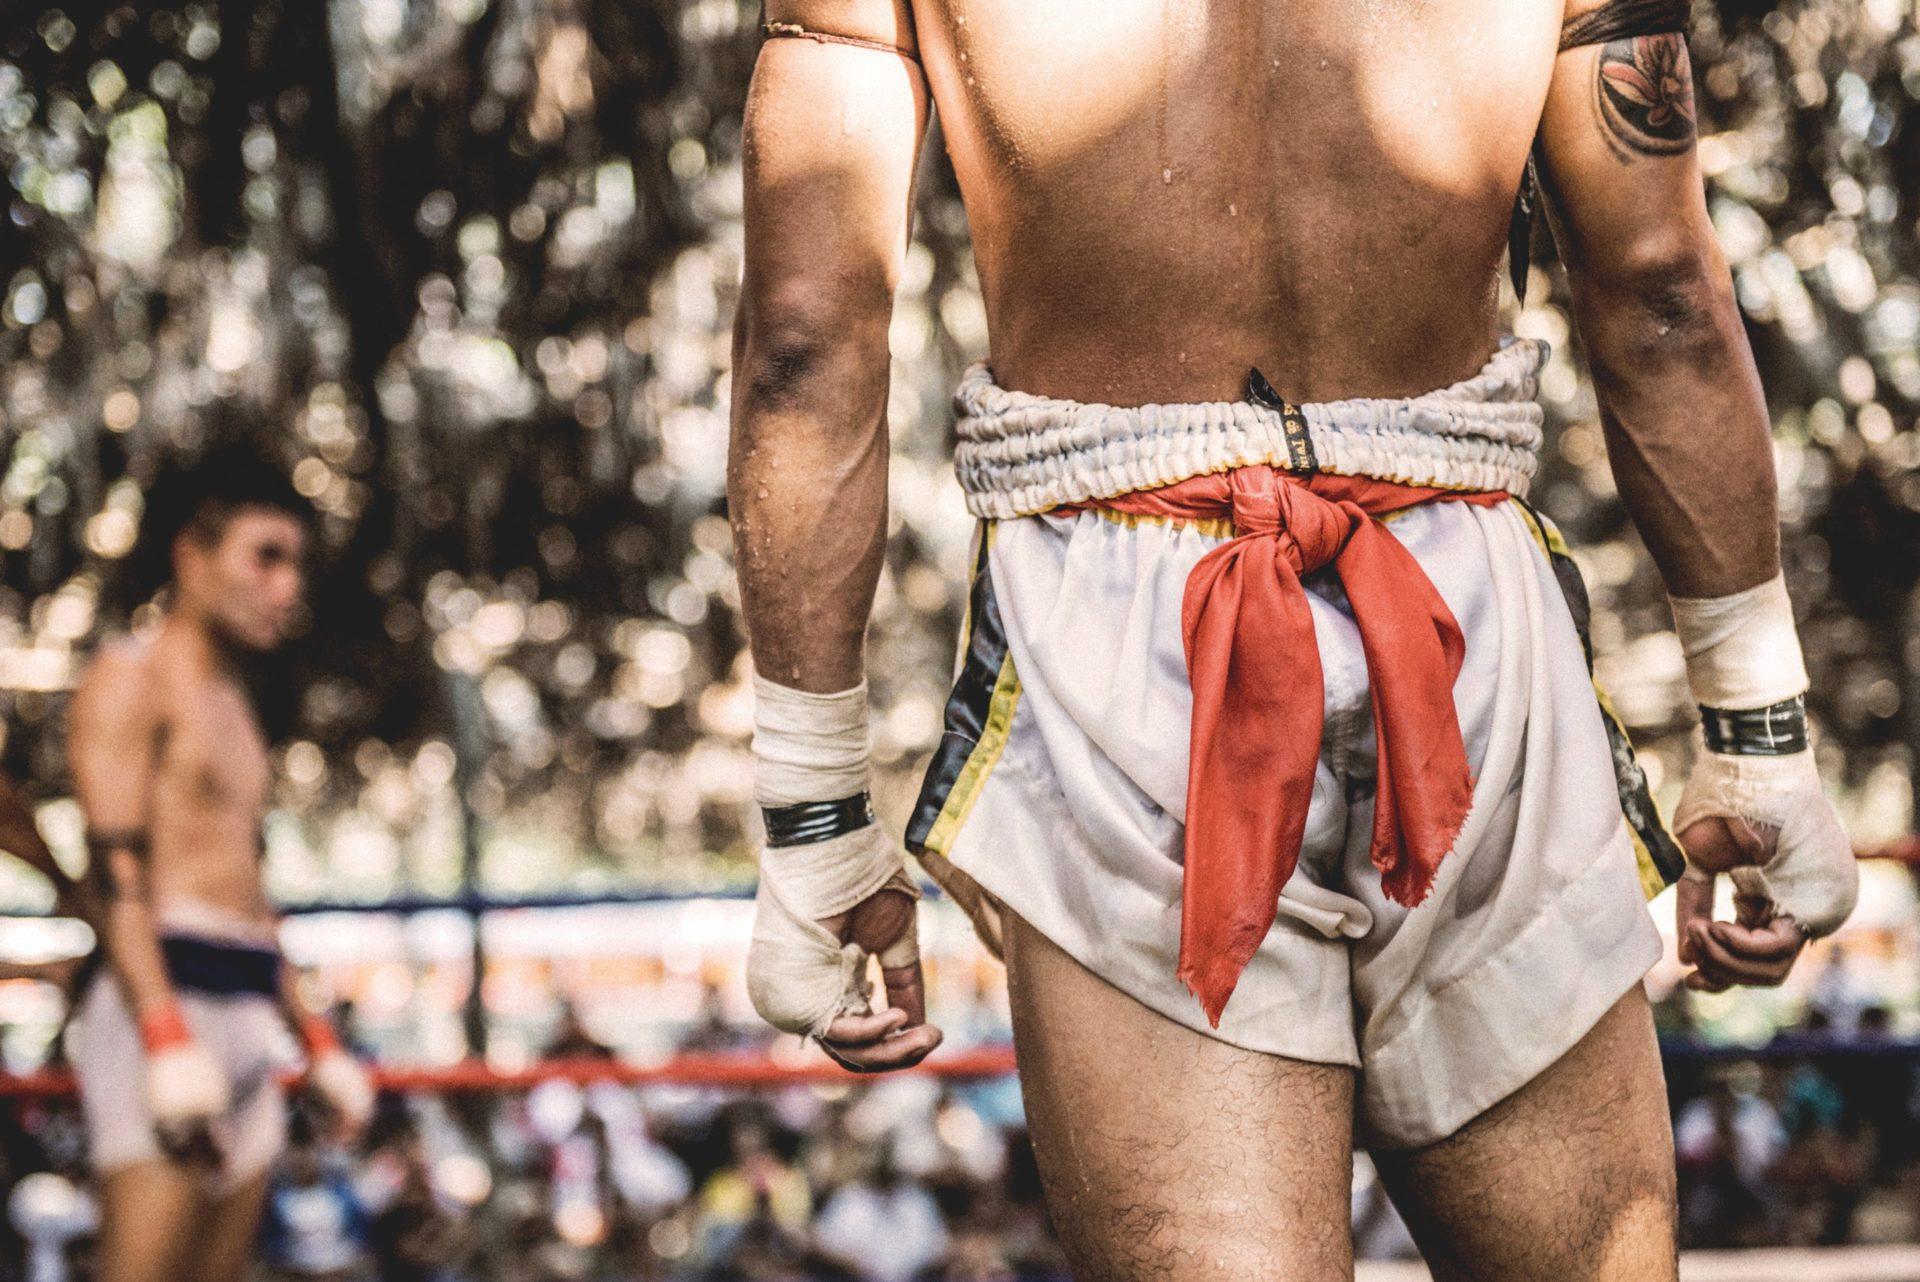 stamberga scaled - Milano Photofestival